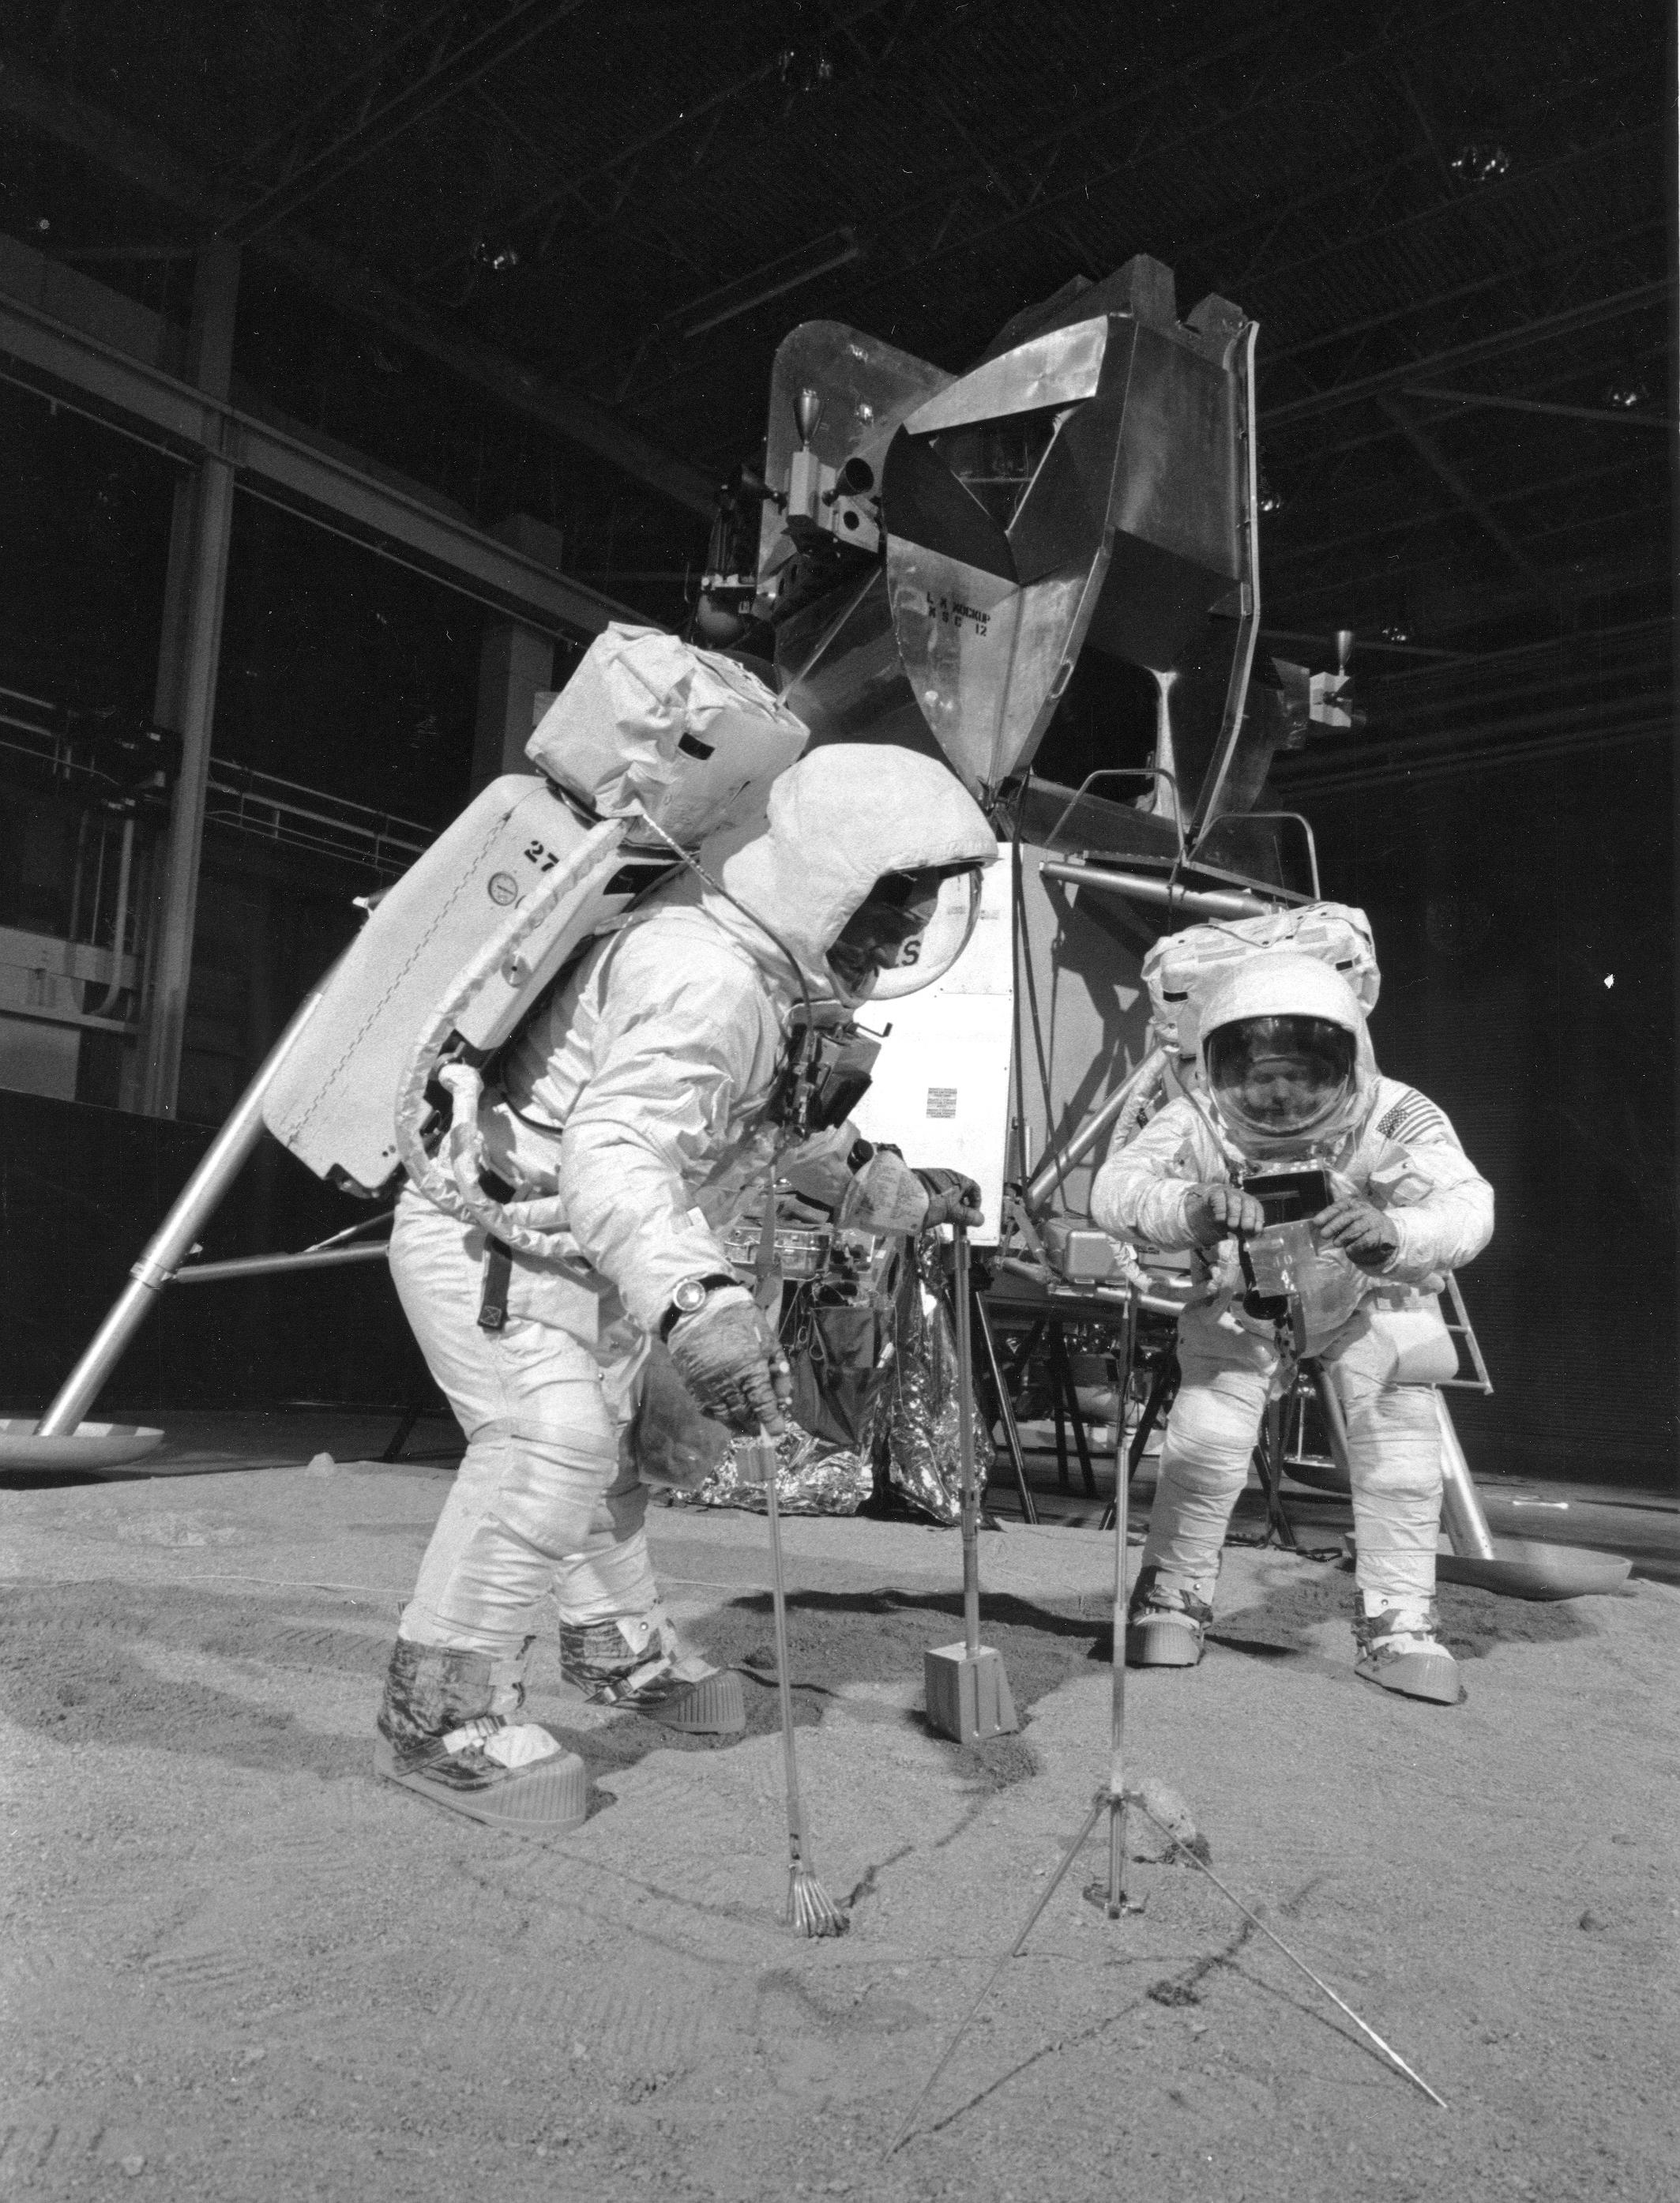 Apollo_11_Crew_During_Training_Exercise_-_GPN-2002-000032